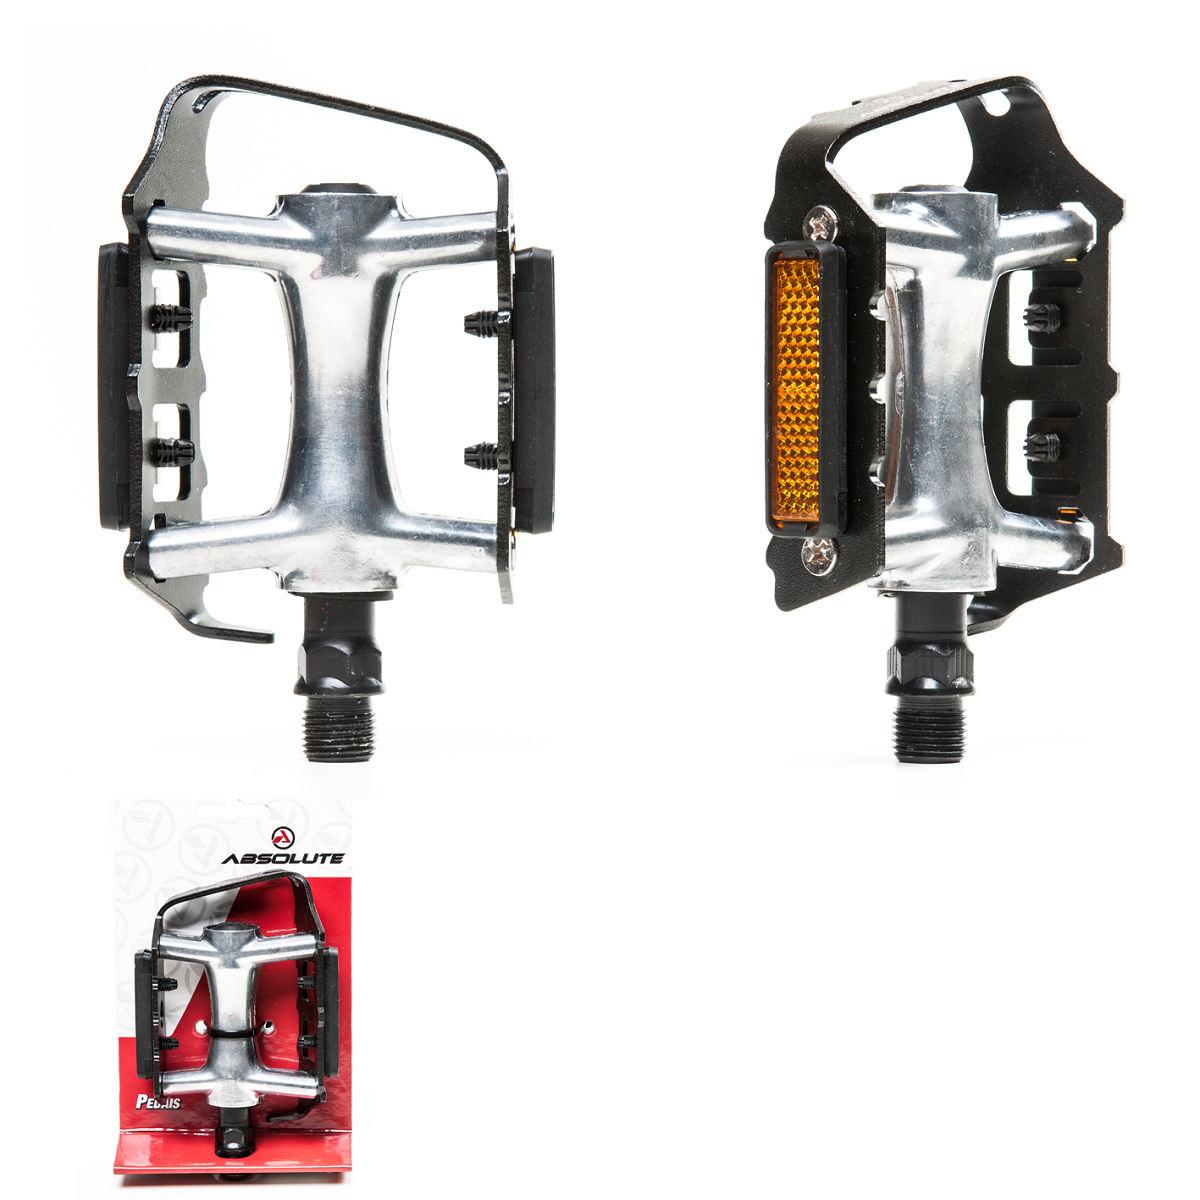 Pedal Bike Absolute Nero Mtb Plataforma Alumínio C/ Refletor 9/16